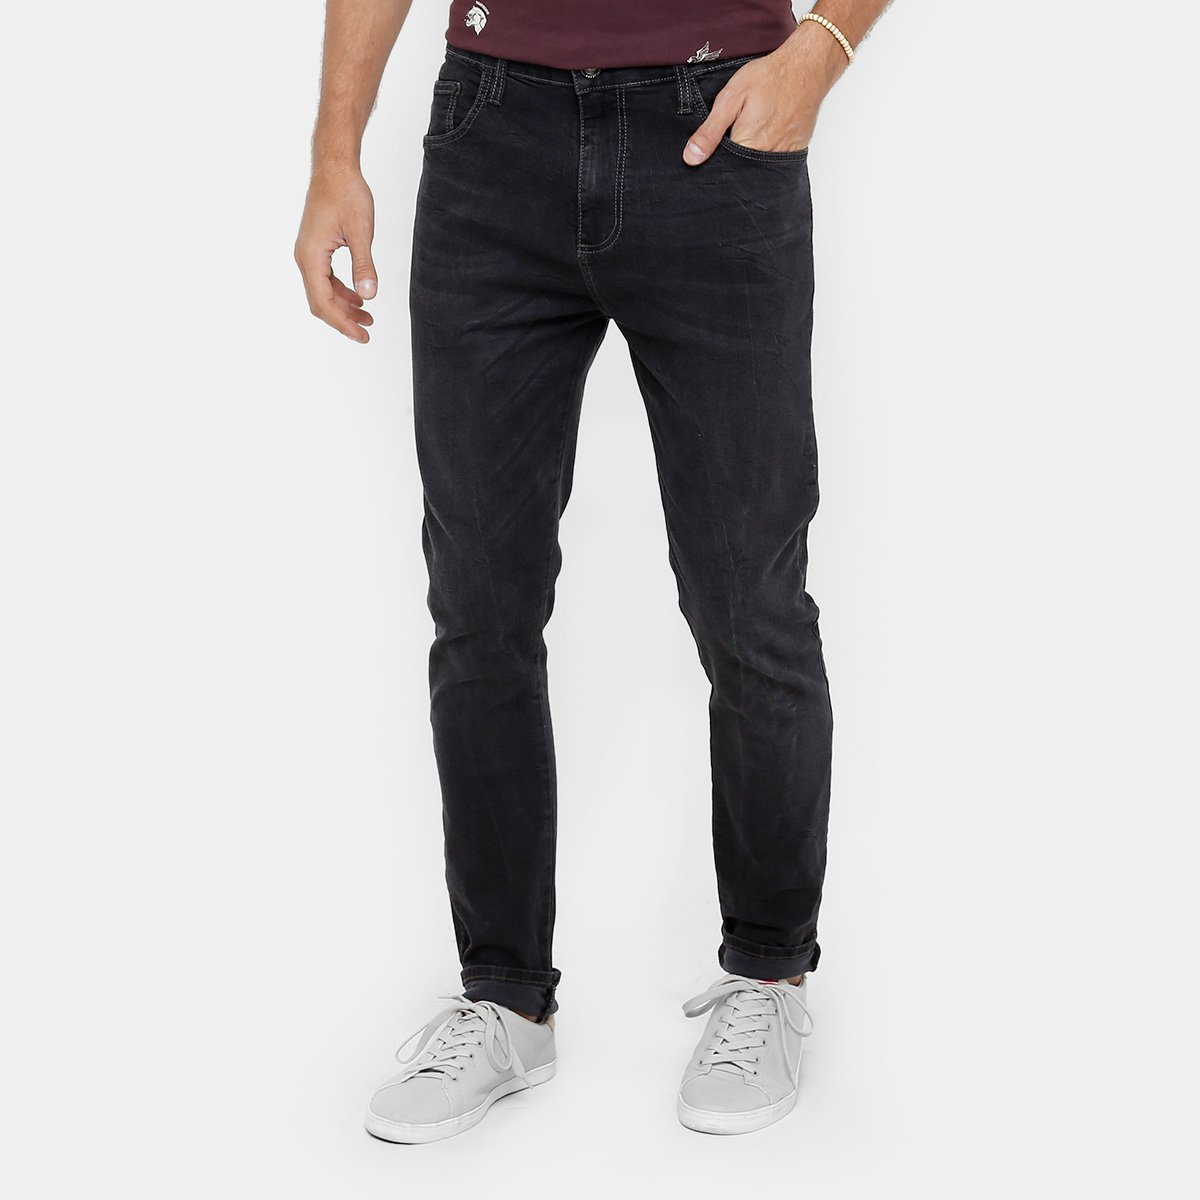 Calça Jeans Skinny Colcci Enrico Lavagem Escura Masculina